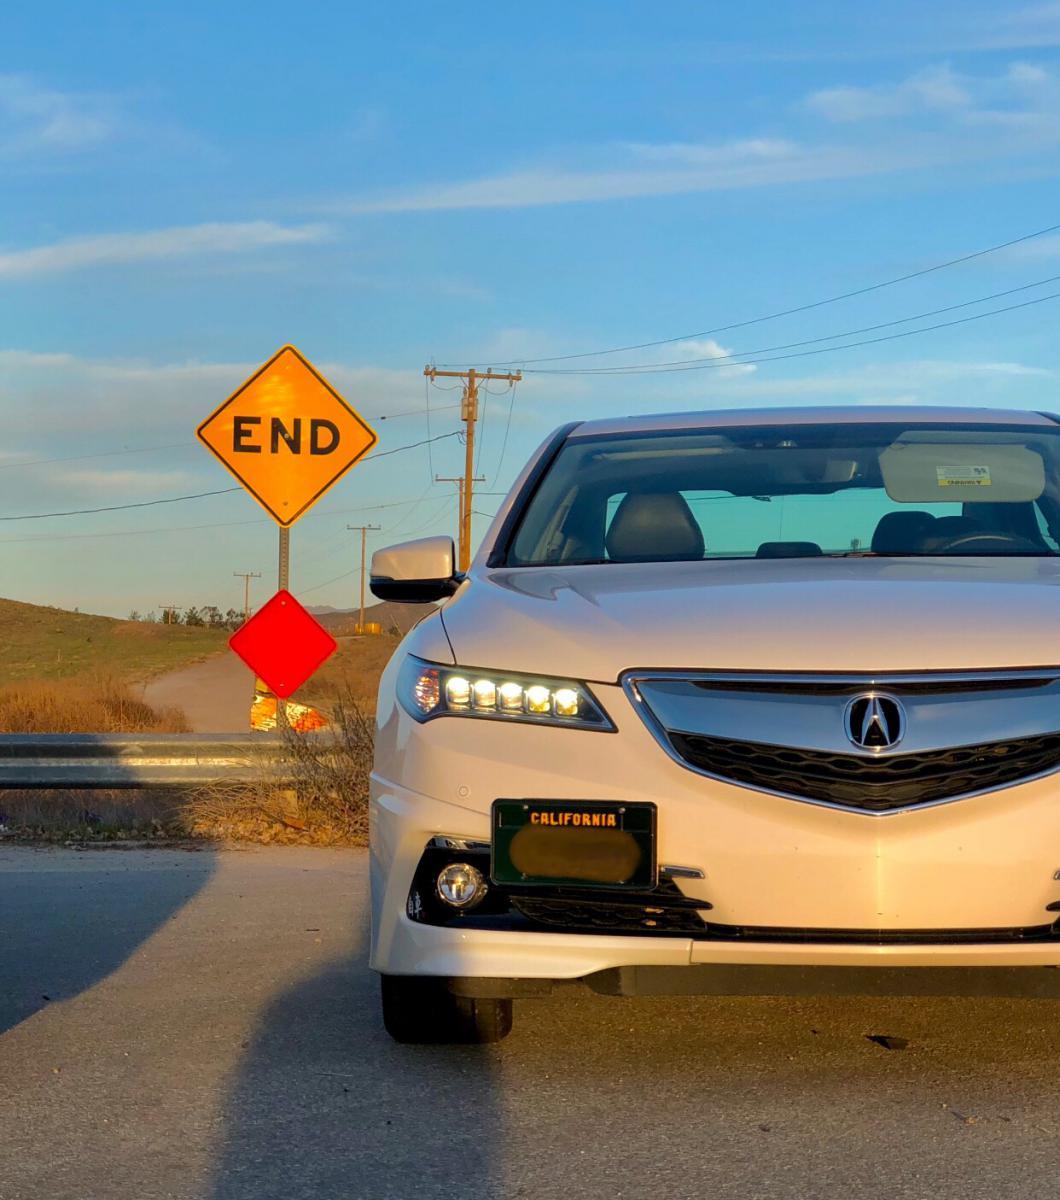 2017 Acura Mdx Sh Awd W Advance Entertainment: 2016 TLX V6 SH-AWD Advanced Package